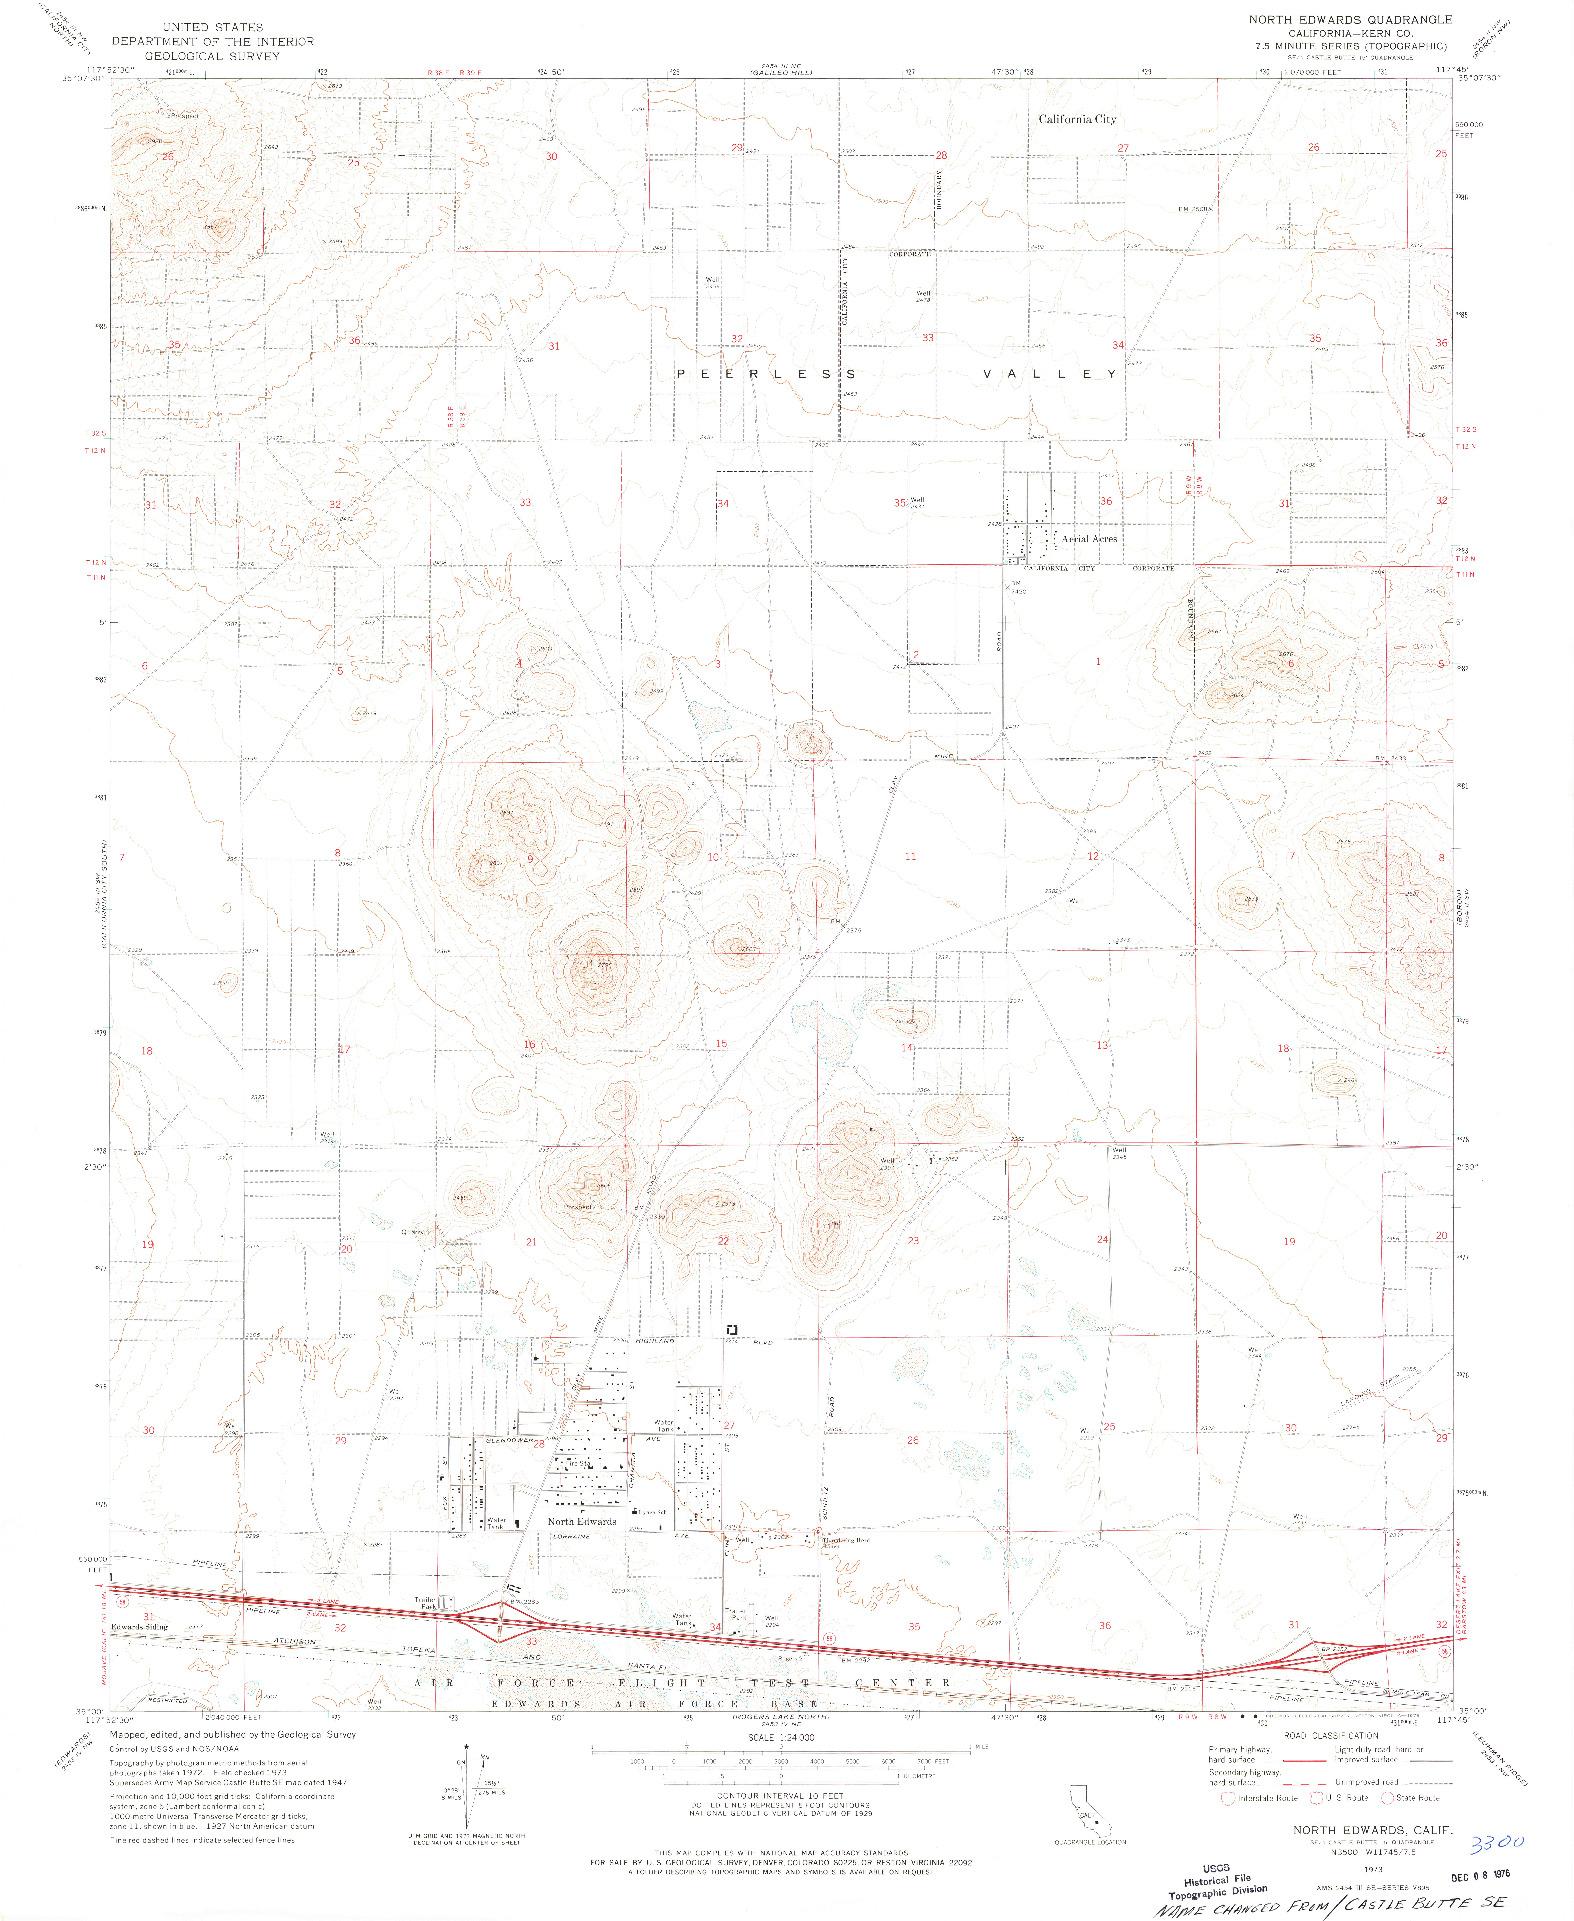 USGS 1:24000-SCALE QUADRANGLE FOR NORTH EDWARDS, CA 1973